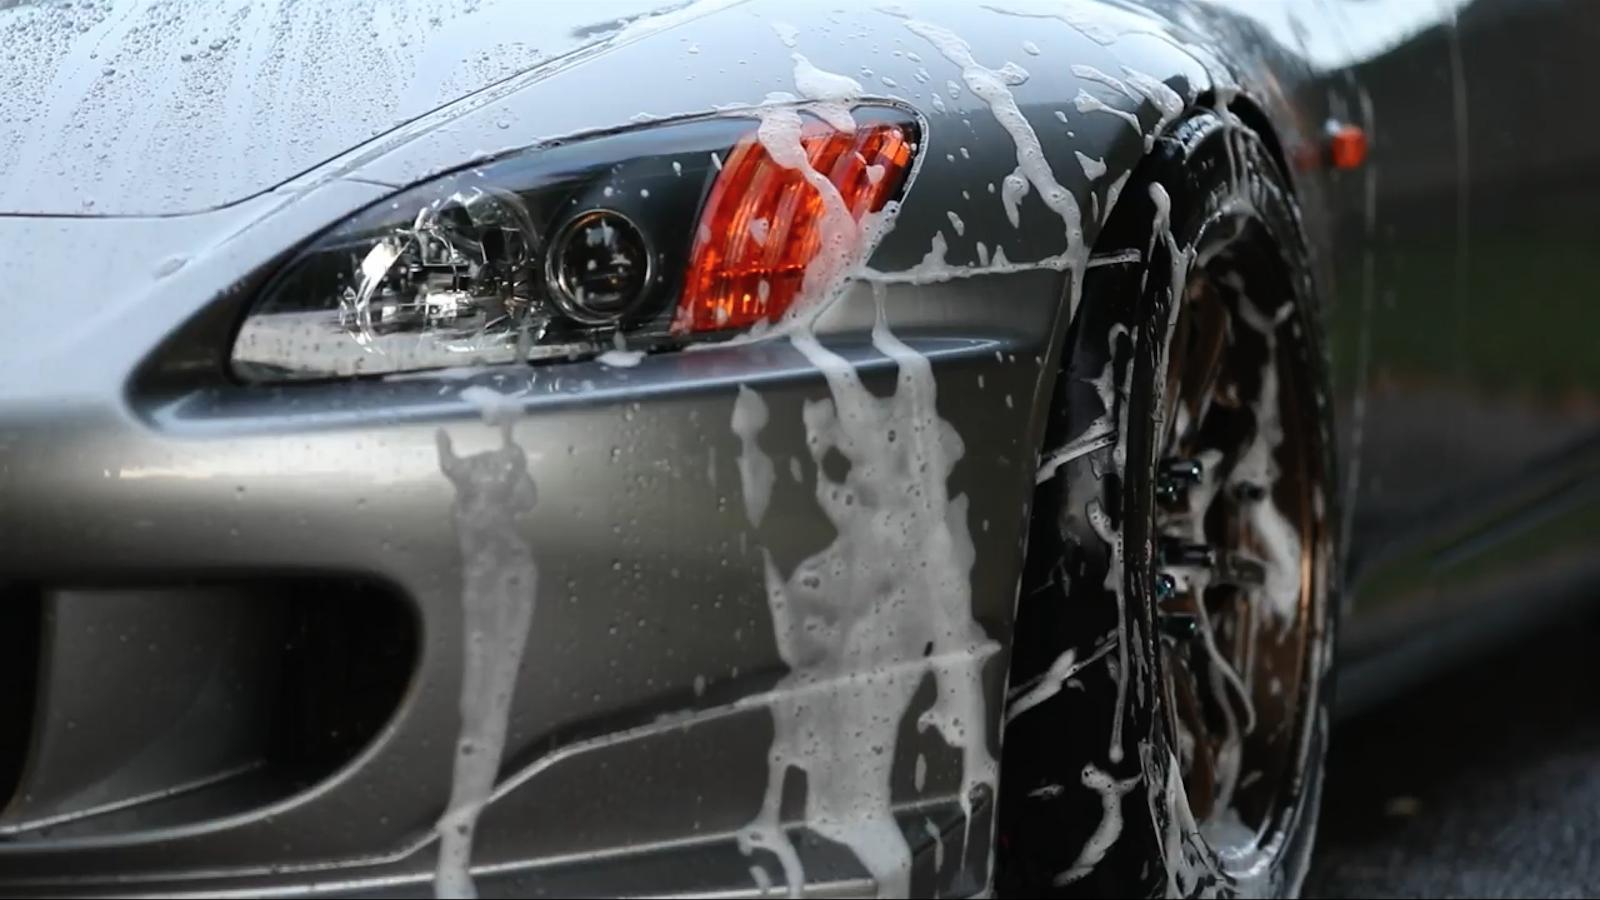 S2000 Cleaning Detailing Washing